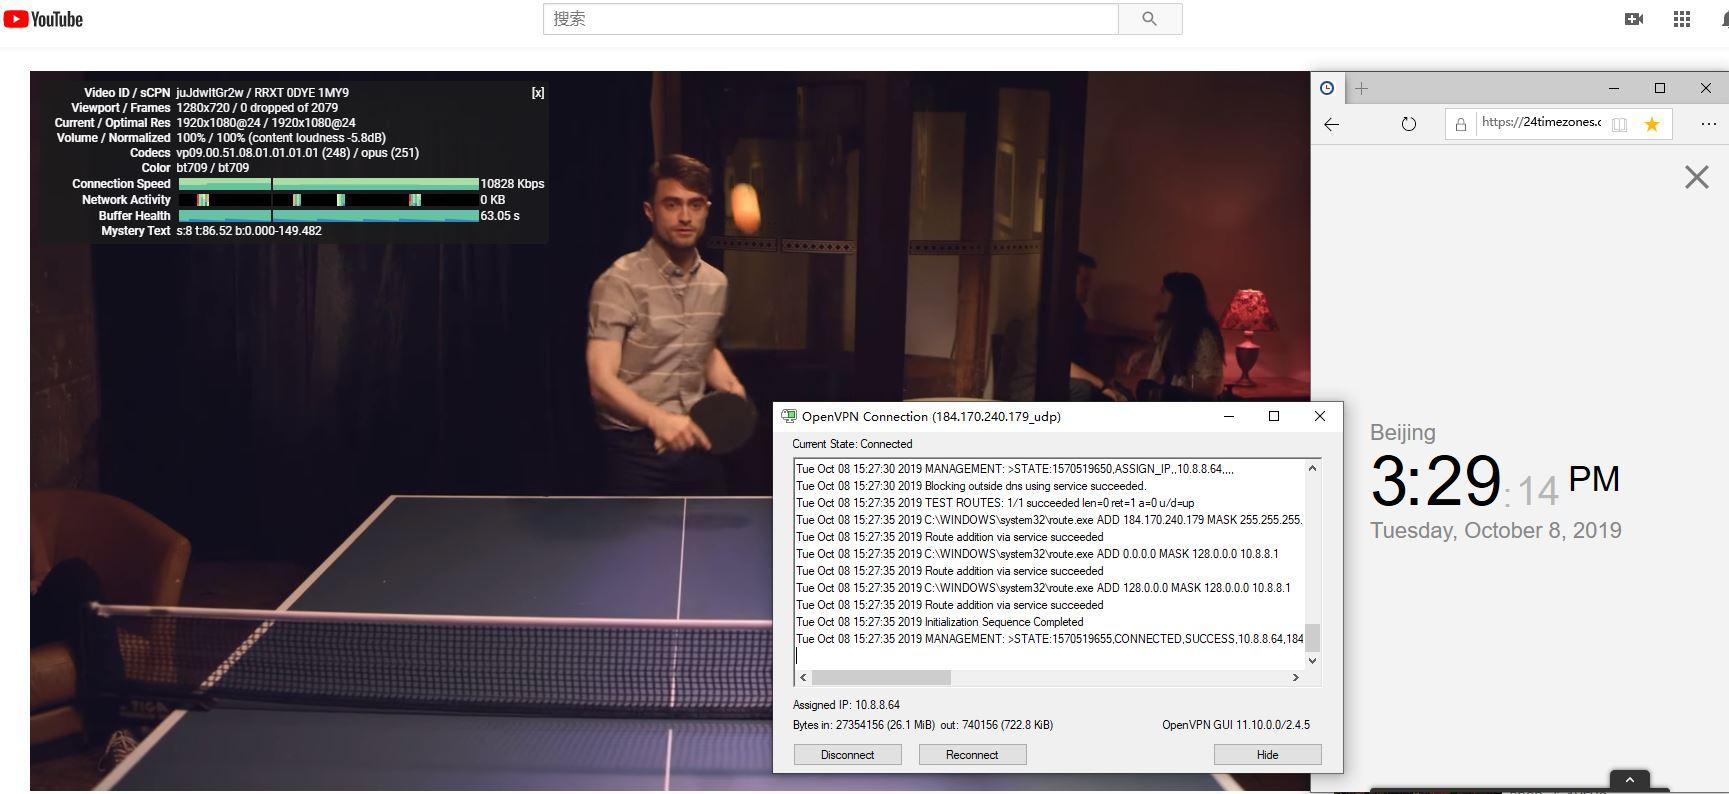 Windows IvacyVPN OPENVPN GUI 184-UDP 中国VPN翻墙 科学上网 YouTube测速-20191008